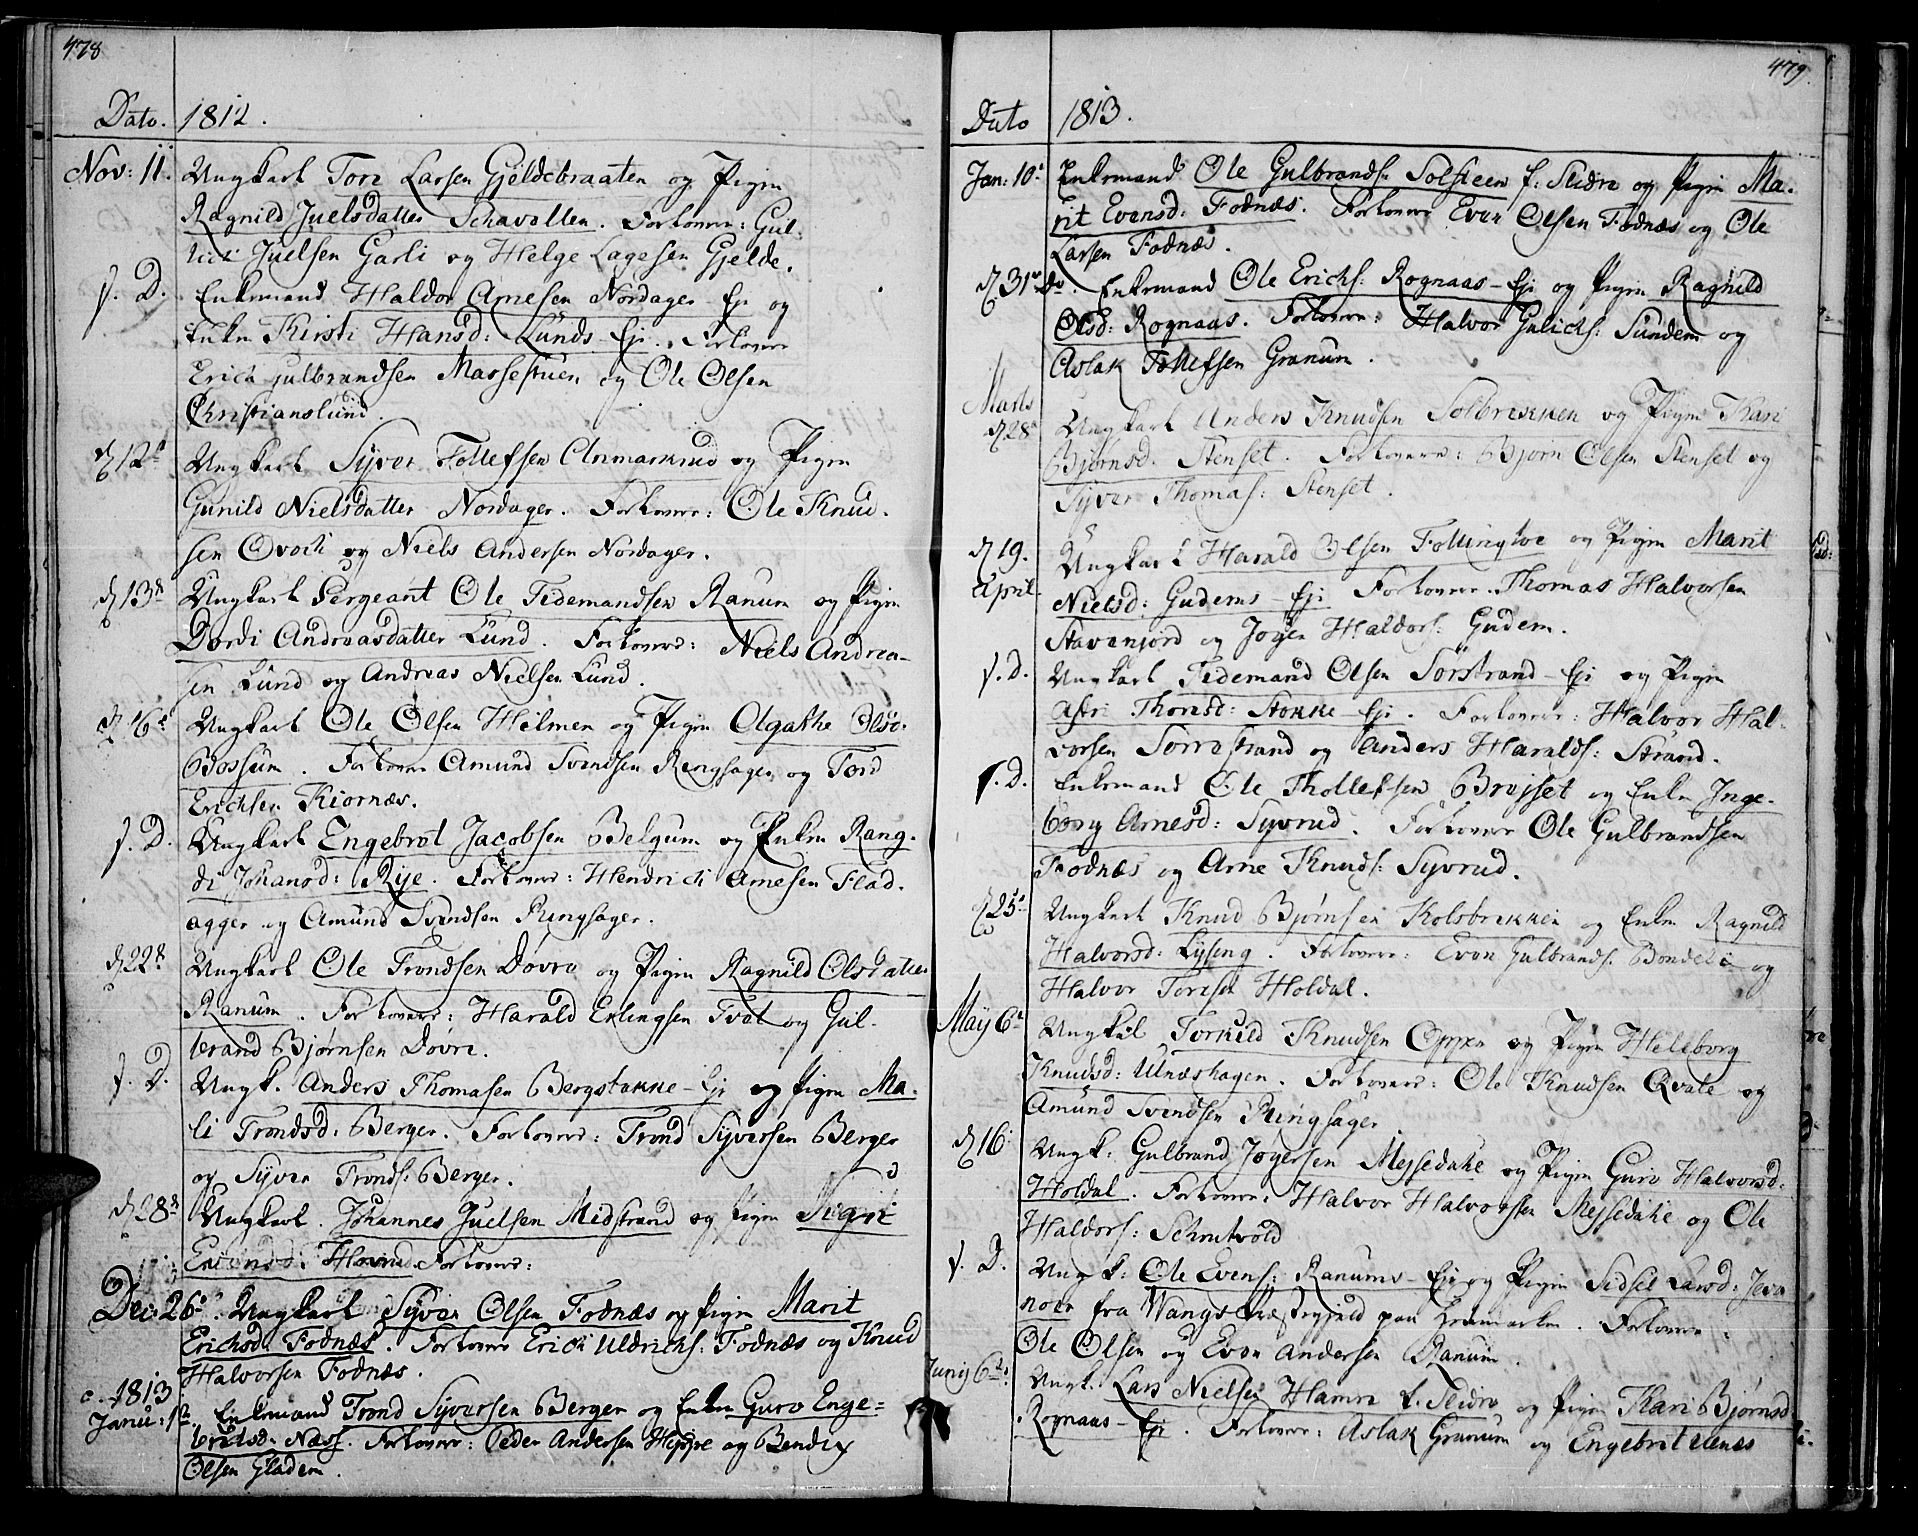 SAH, Nord-Aurdal prestekontor, Ministerialbok nr. 1, 1808-1815, s. 478-479